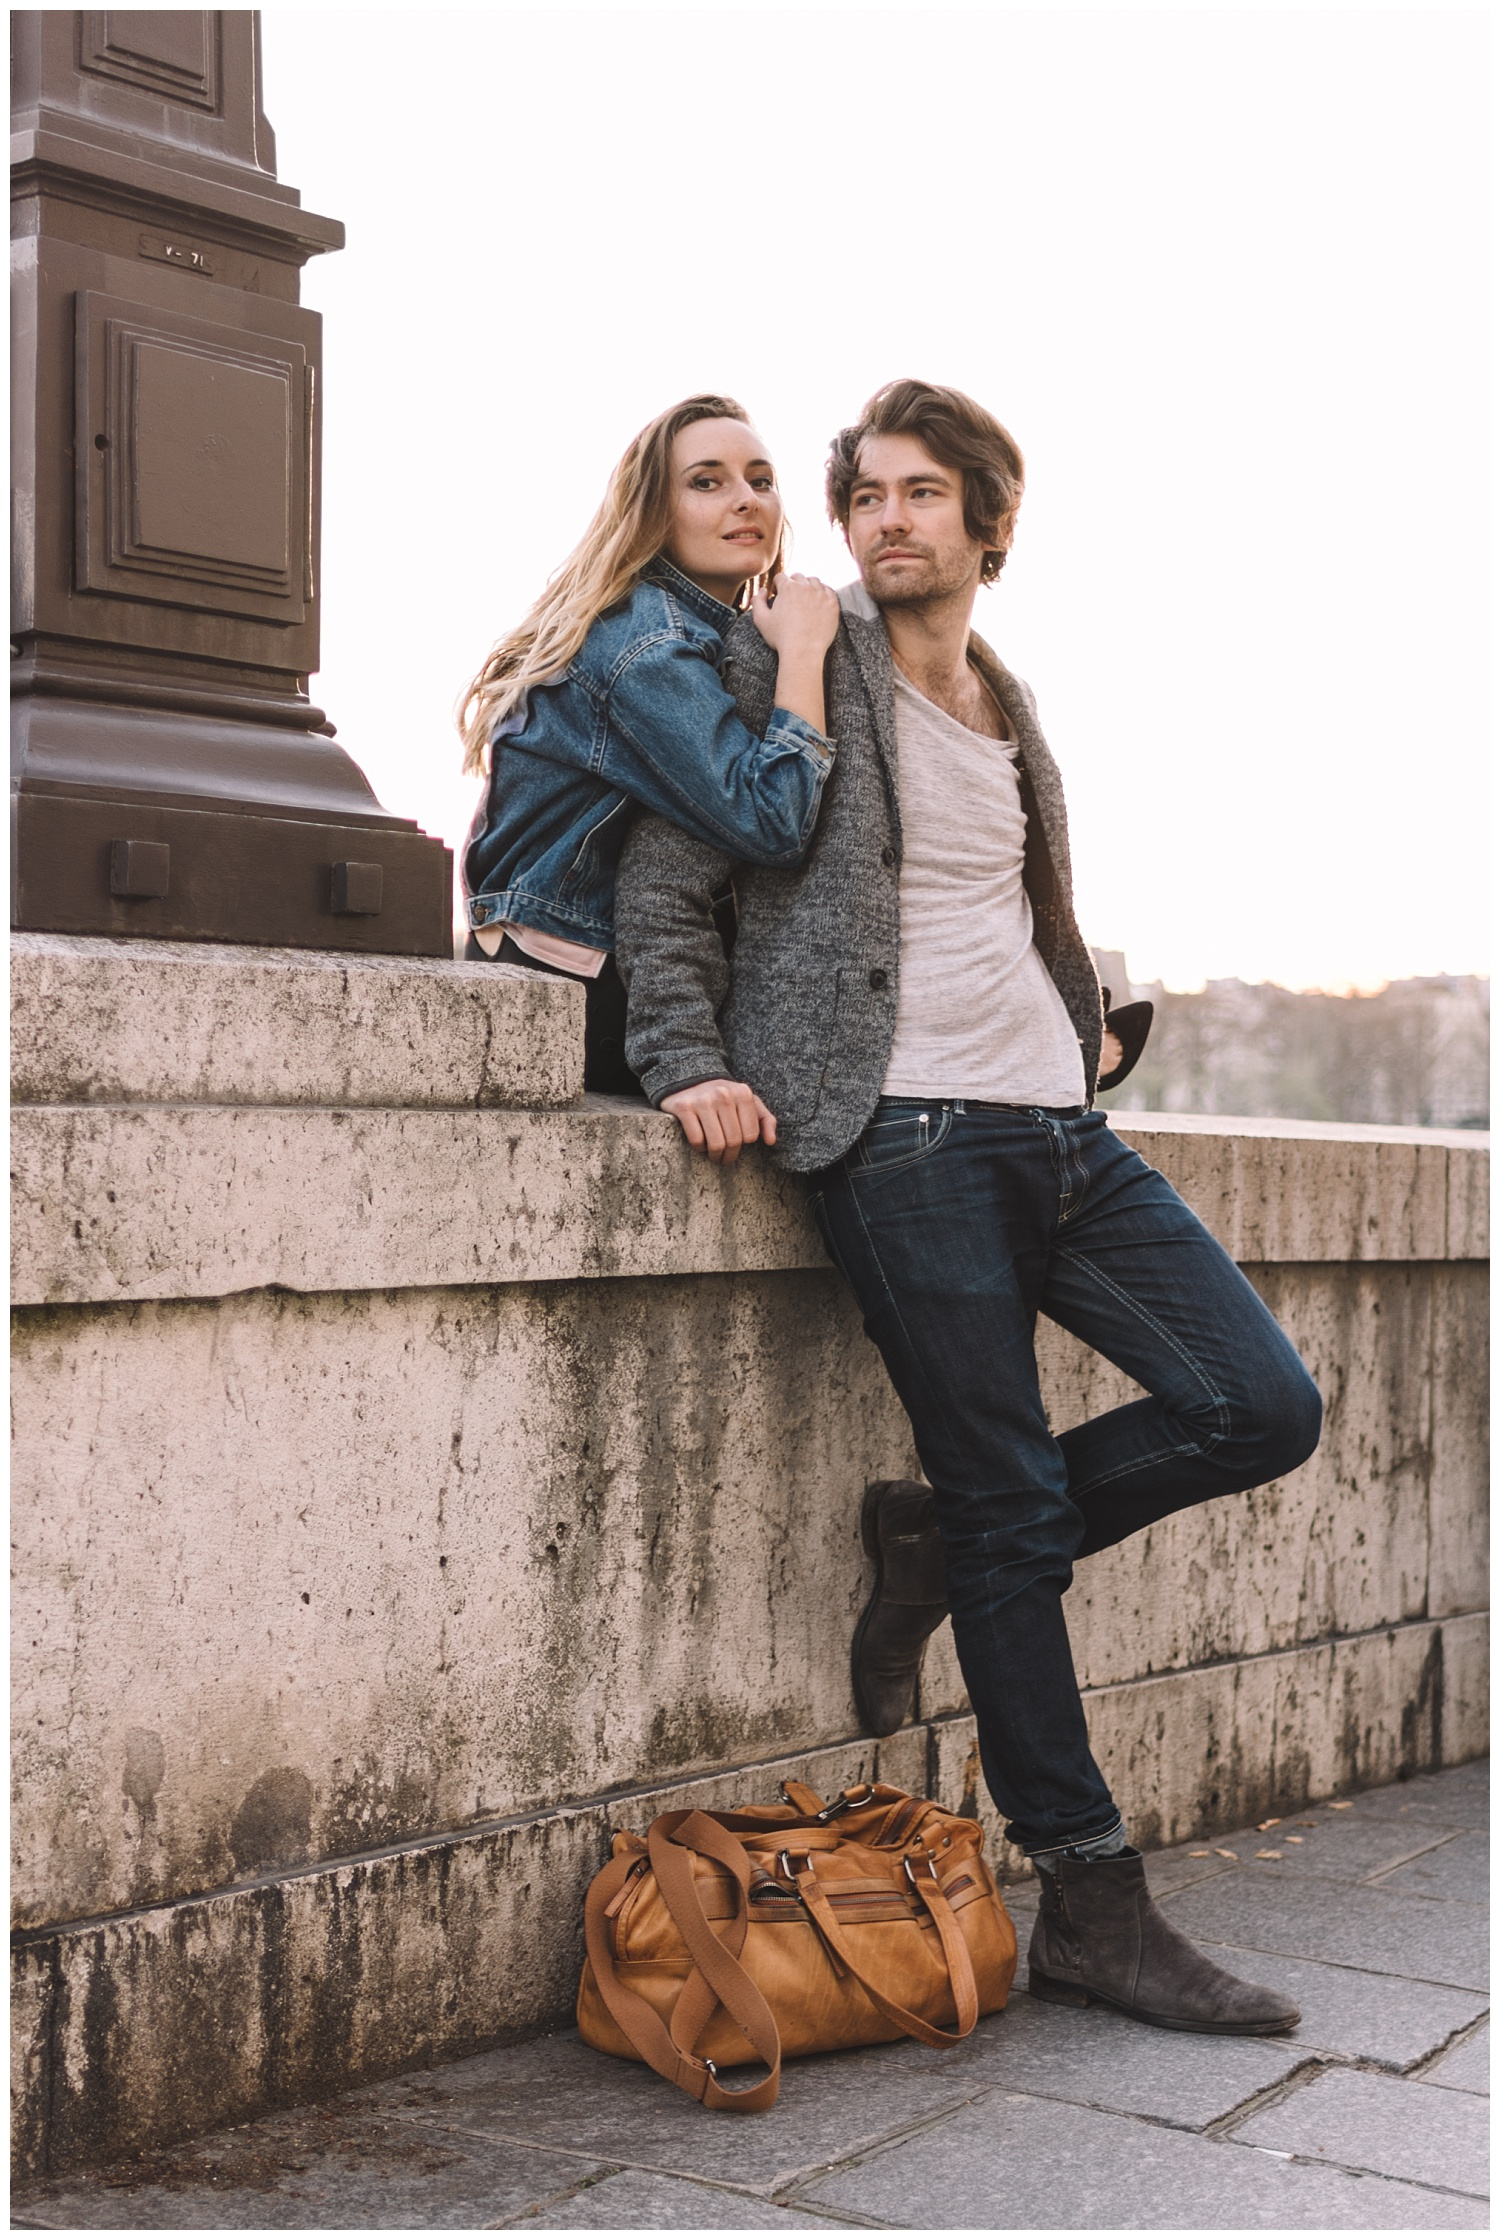 Tatiana_Liam_couple__session_Gaetan_Jargot_0012.jpg